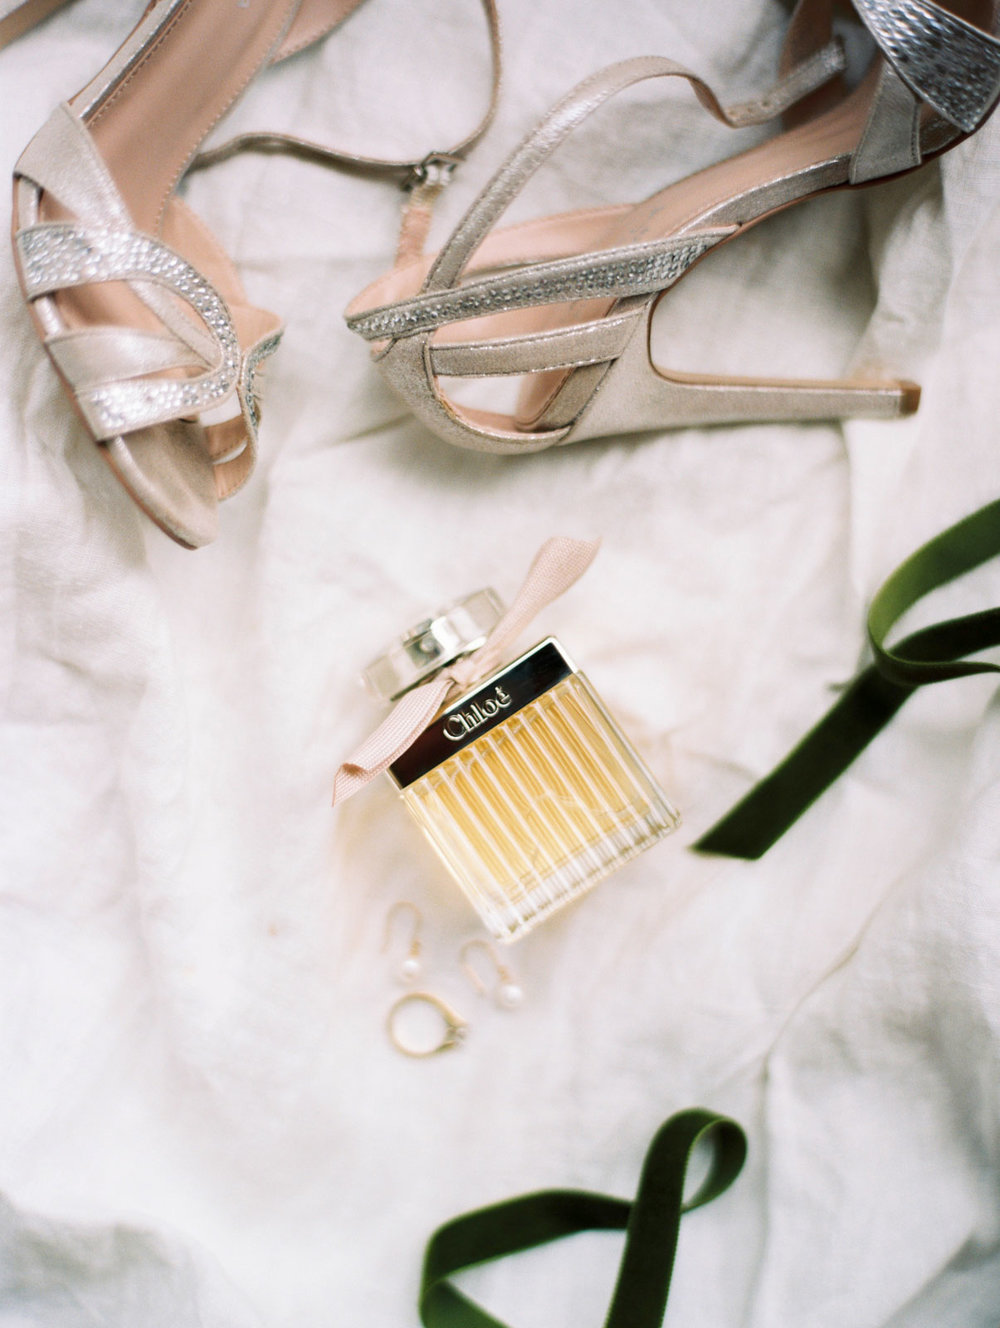 Adelaide Wedding Shoes near Chloe bridal perfume